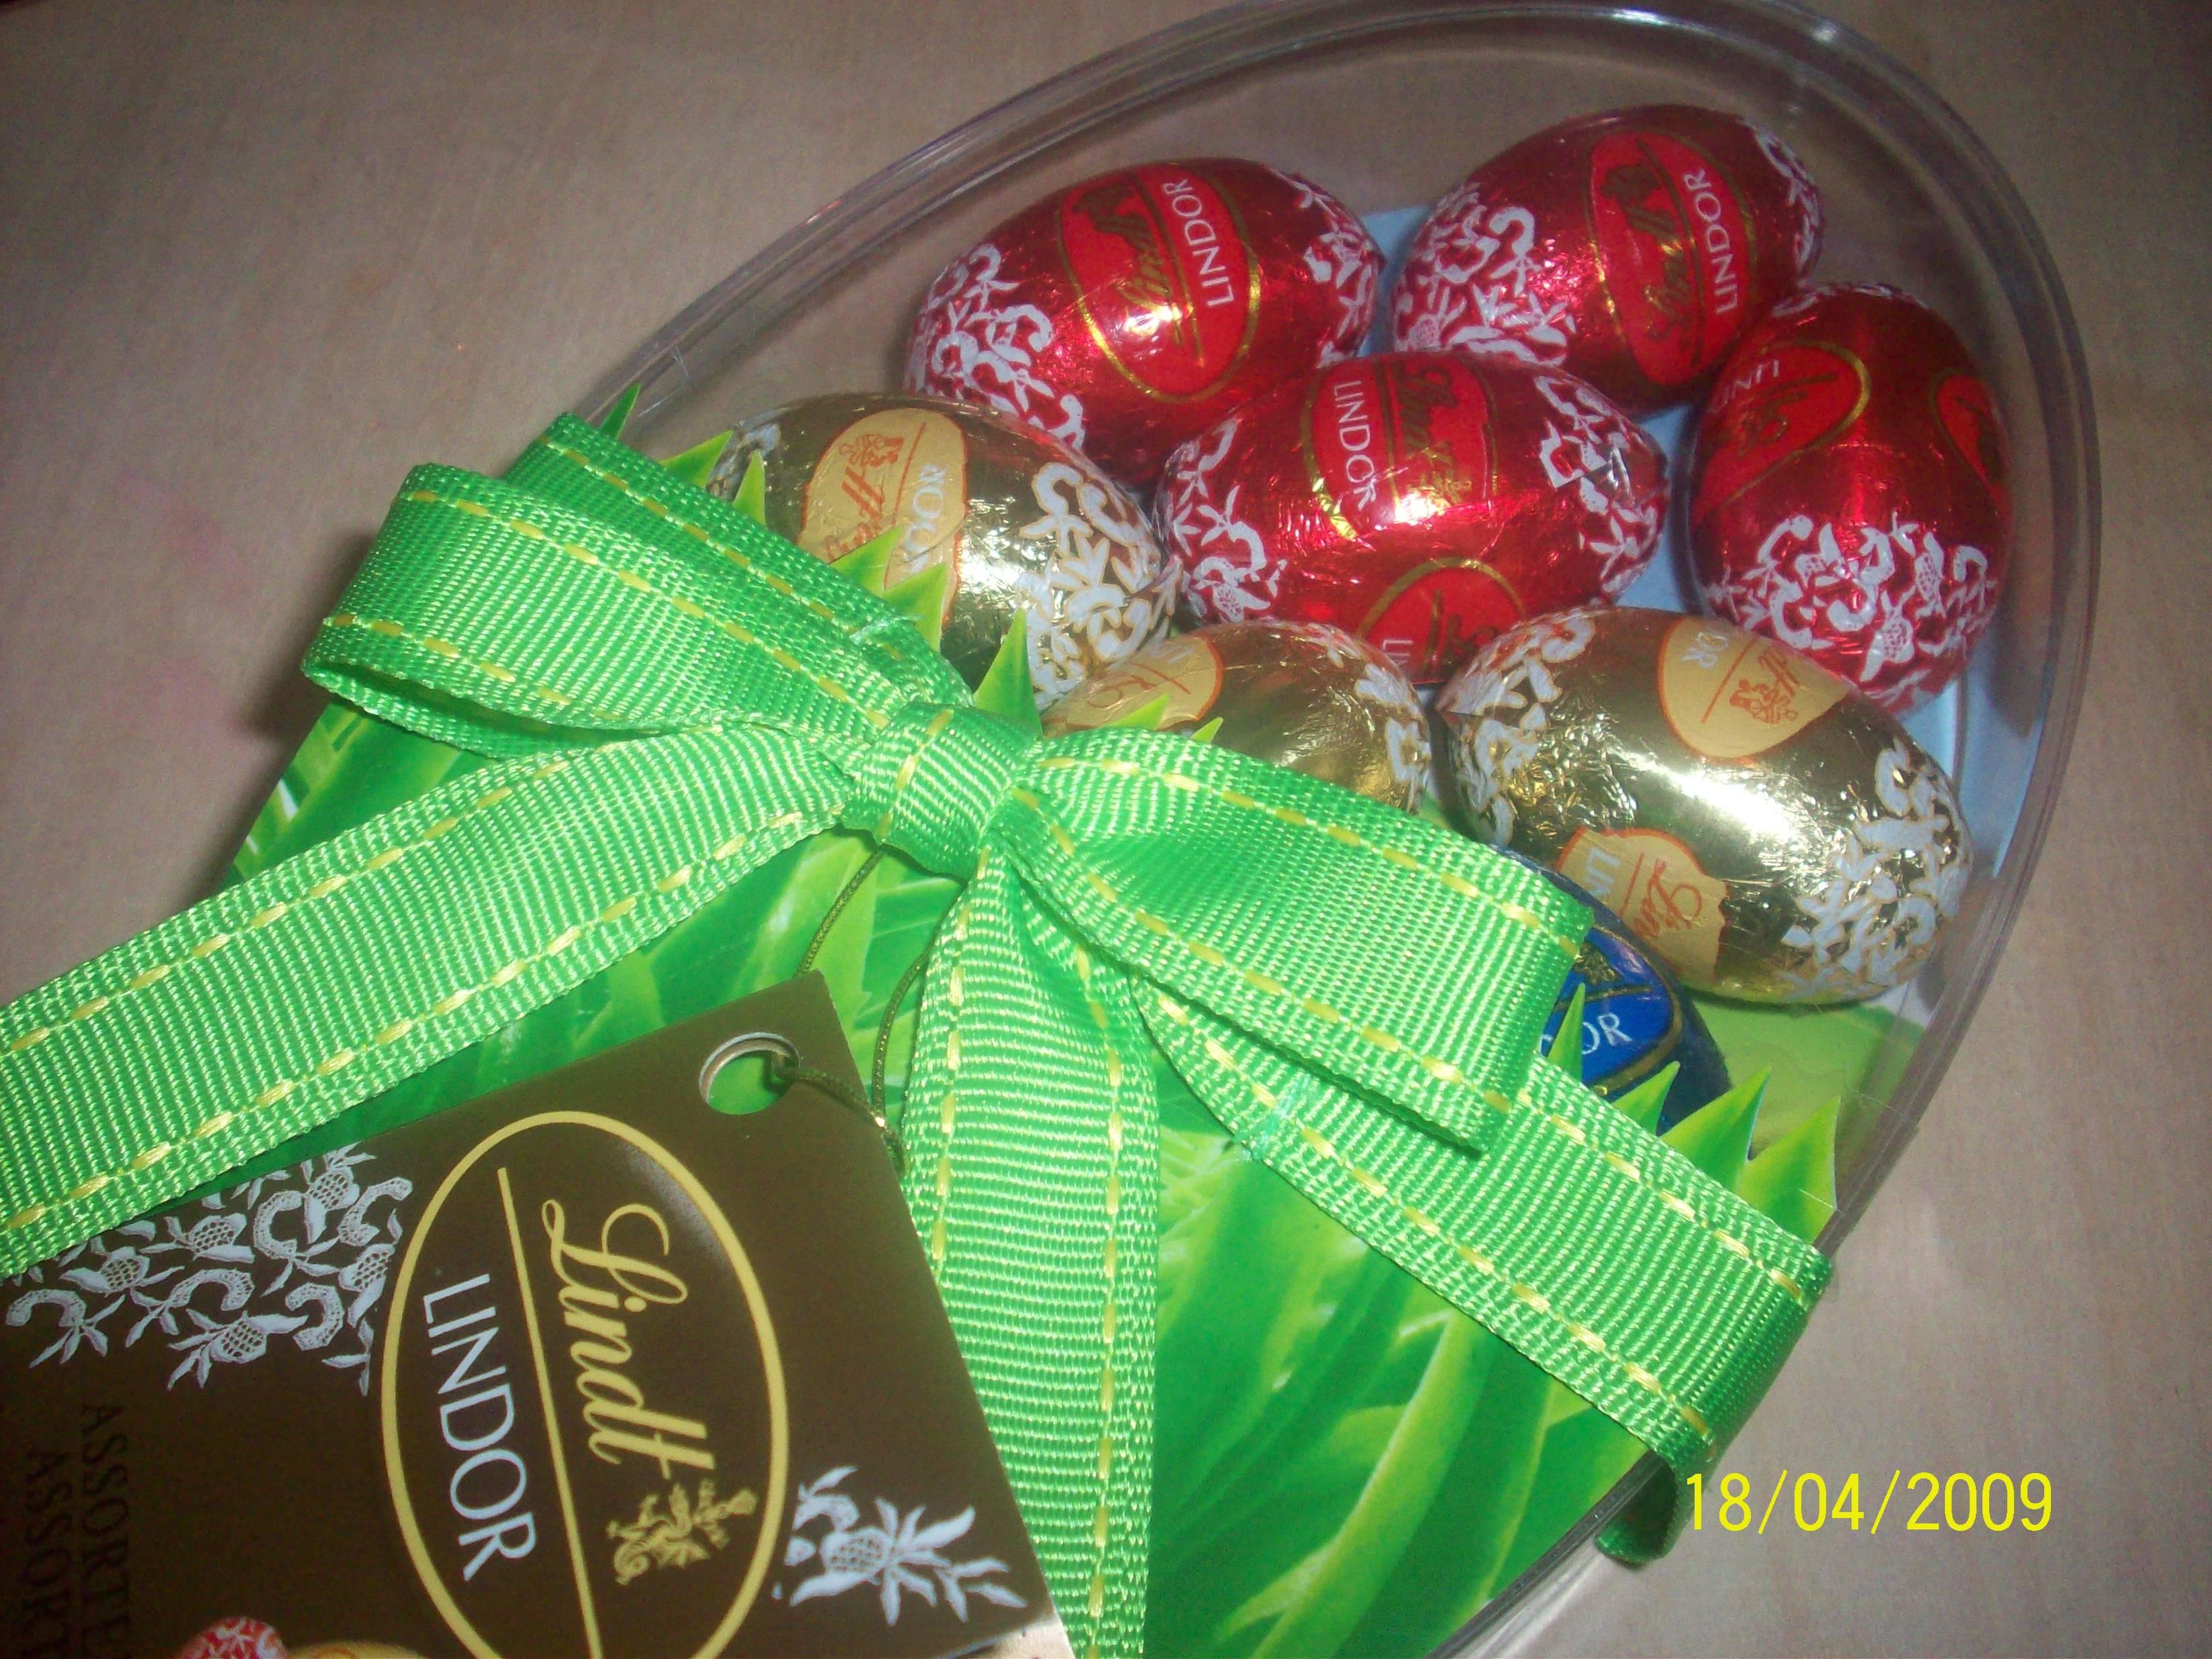 https://foodloader.net/cutie_2009-04-18_Lindt_Chocolates1.jpg